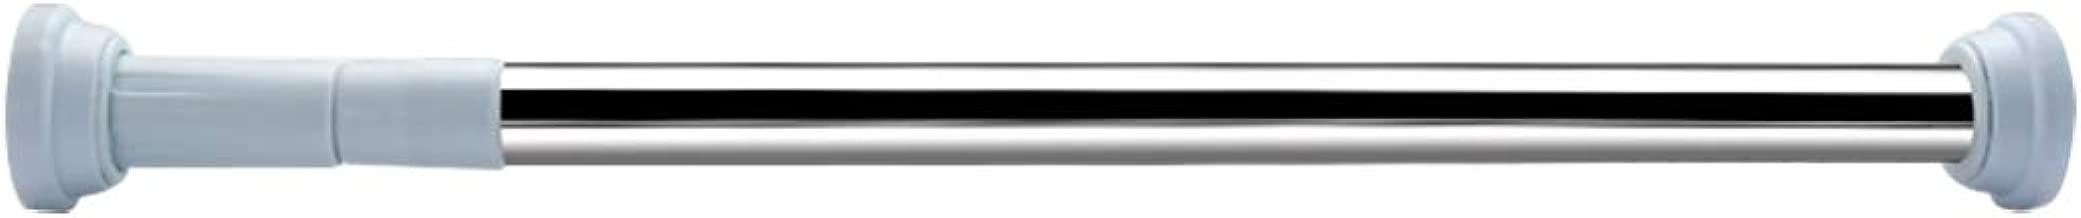 Perchero de Esquina Accesorios de guardarropa Perchero Clothes rail Herrajes de guardarropas Giratorio tendedero